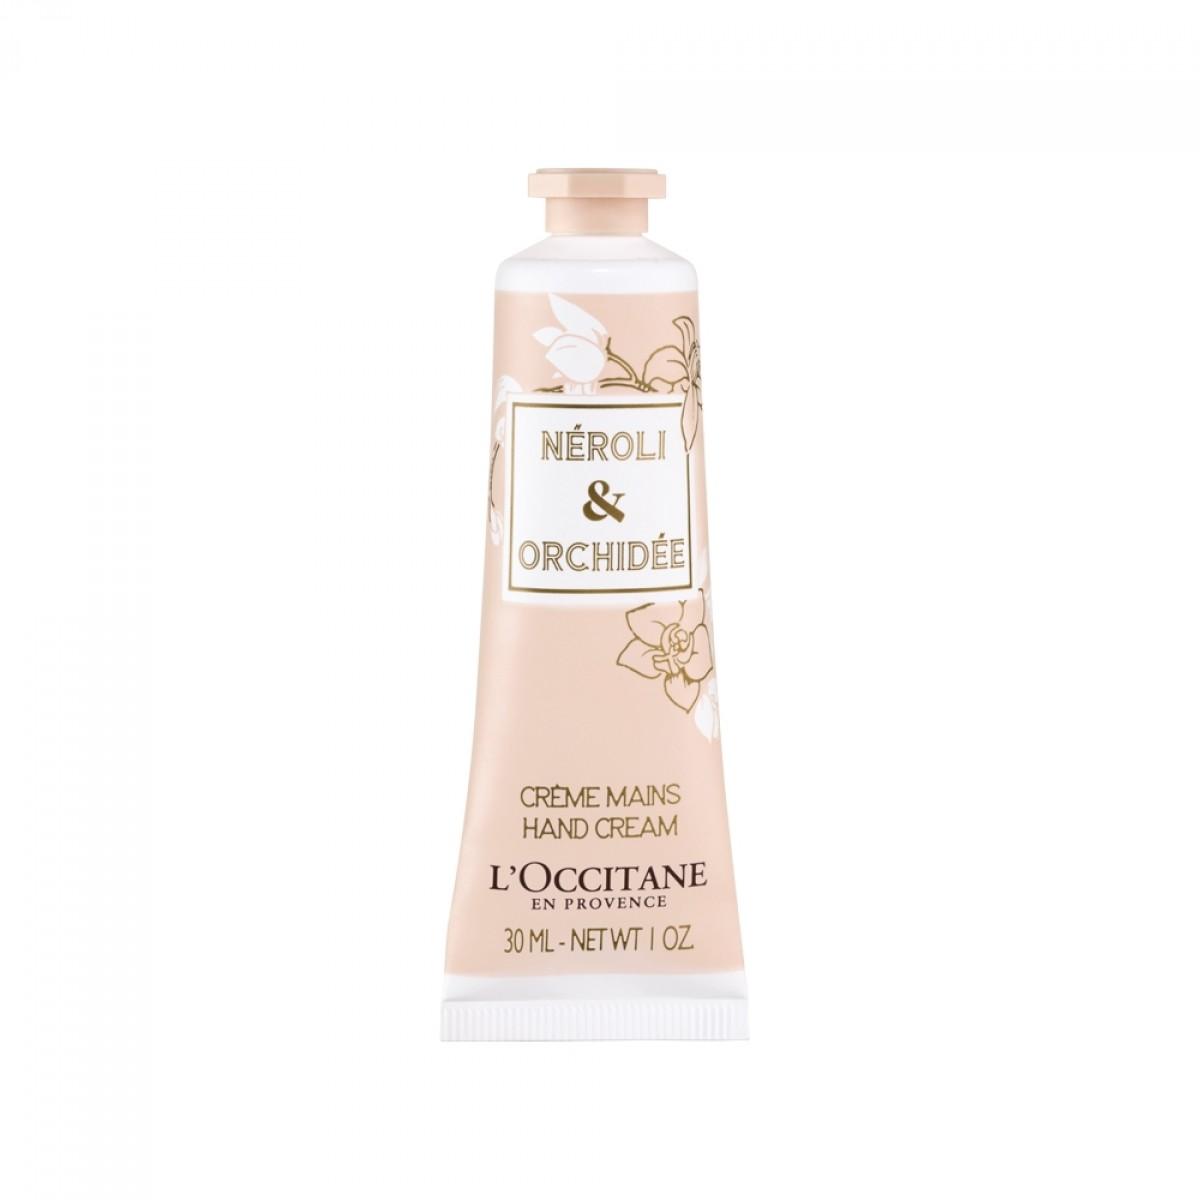 Néroli & Orchidée Hand Cream | Néroli & Orchidée | L